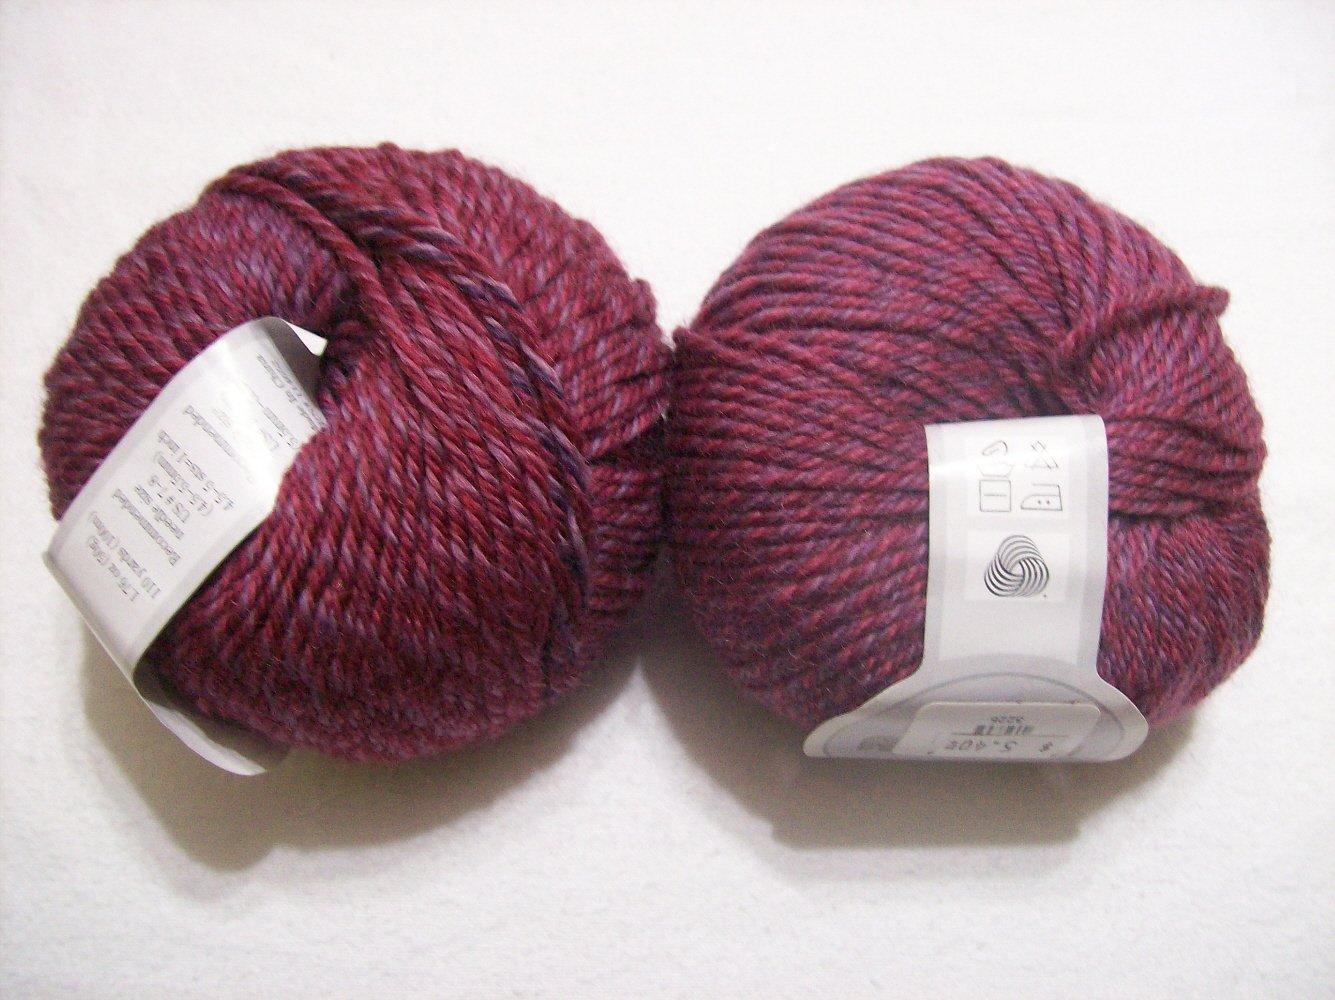 Jojoland Rhythm Yarn, wool, photo by April Garwood of Banana Moon Studio